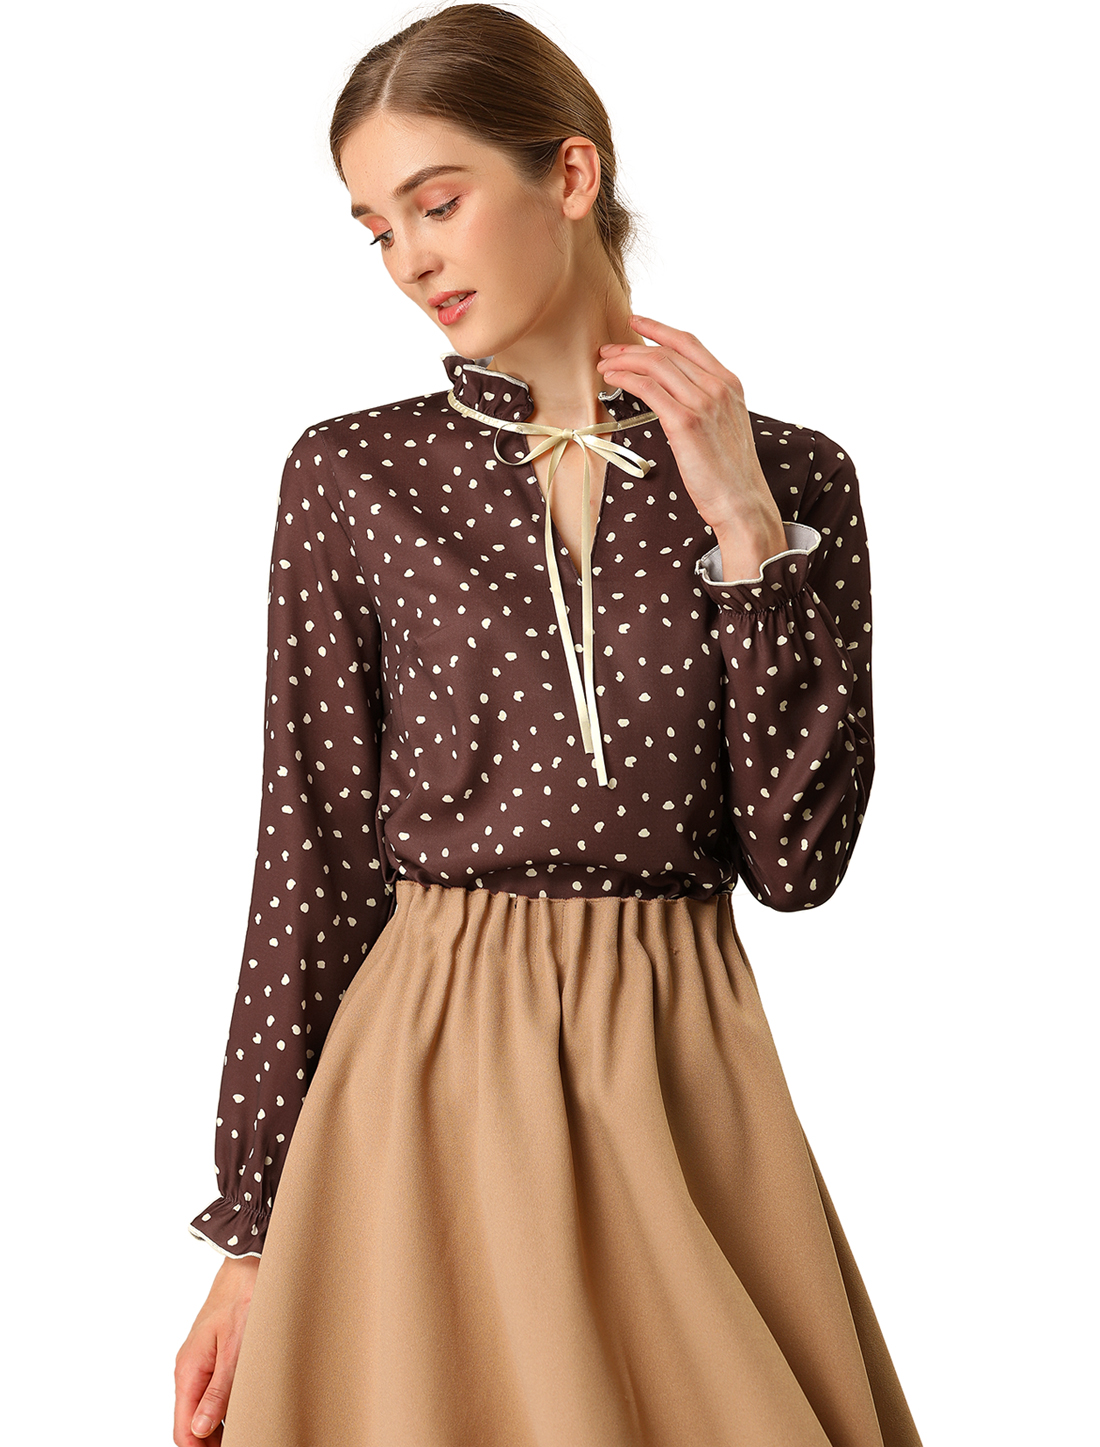 Allegra K Women's Tie Ruffled Neck Polka Dots Blouse Tops Maroon Red S